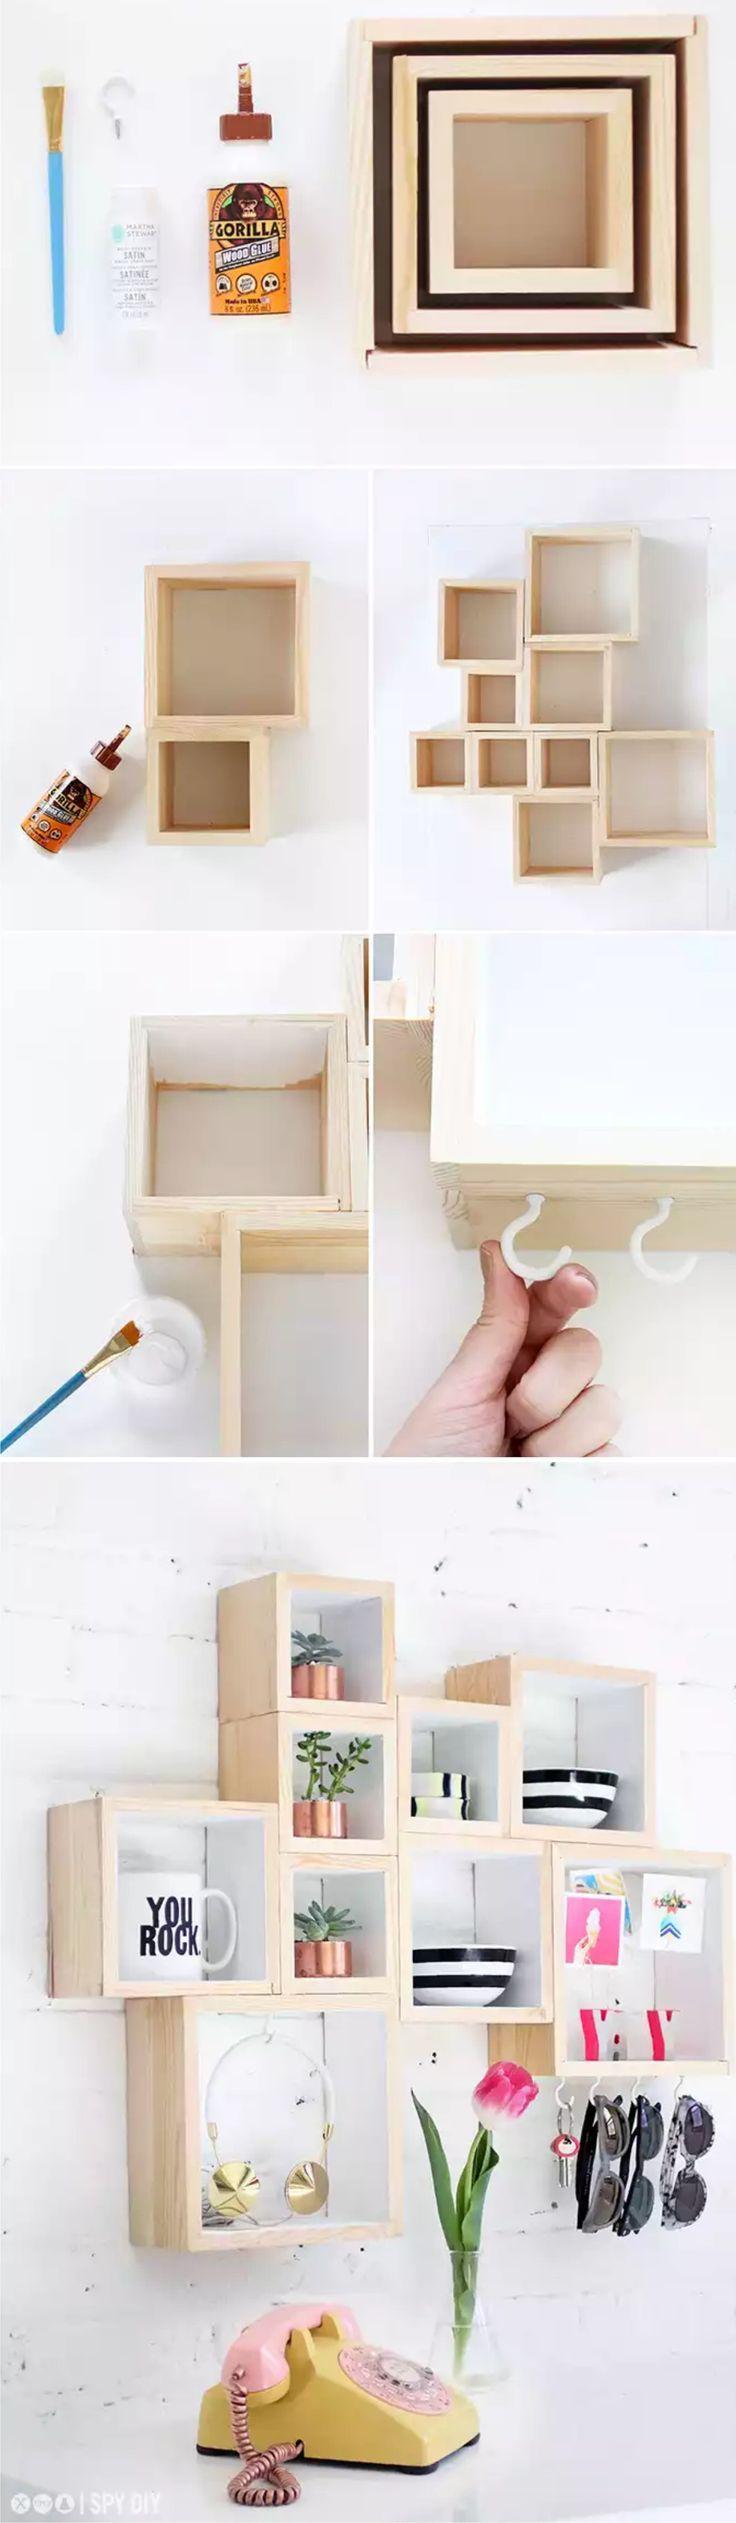 Pequeña estanteria con cajas de madera / Via http://ispydiy.com/